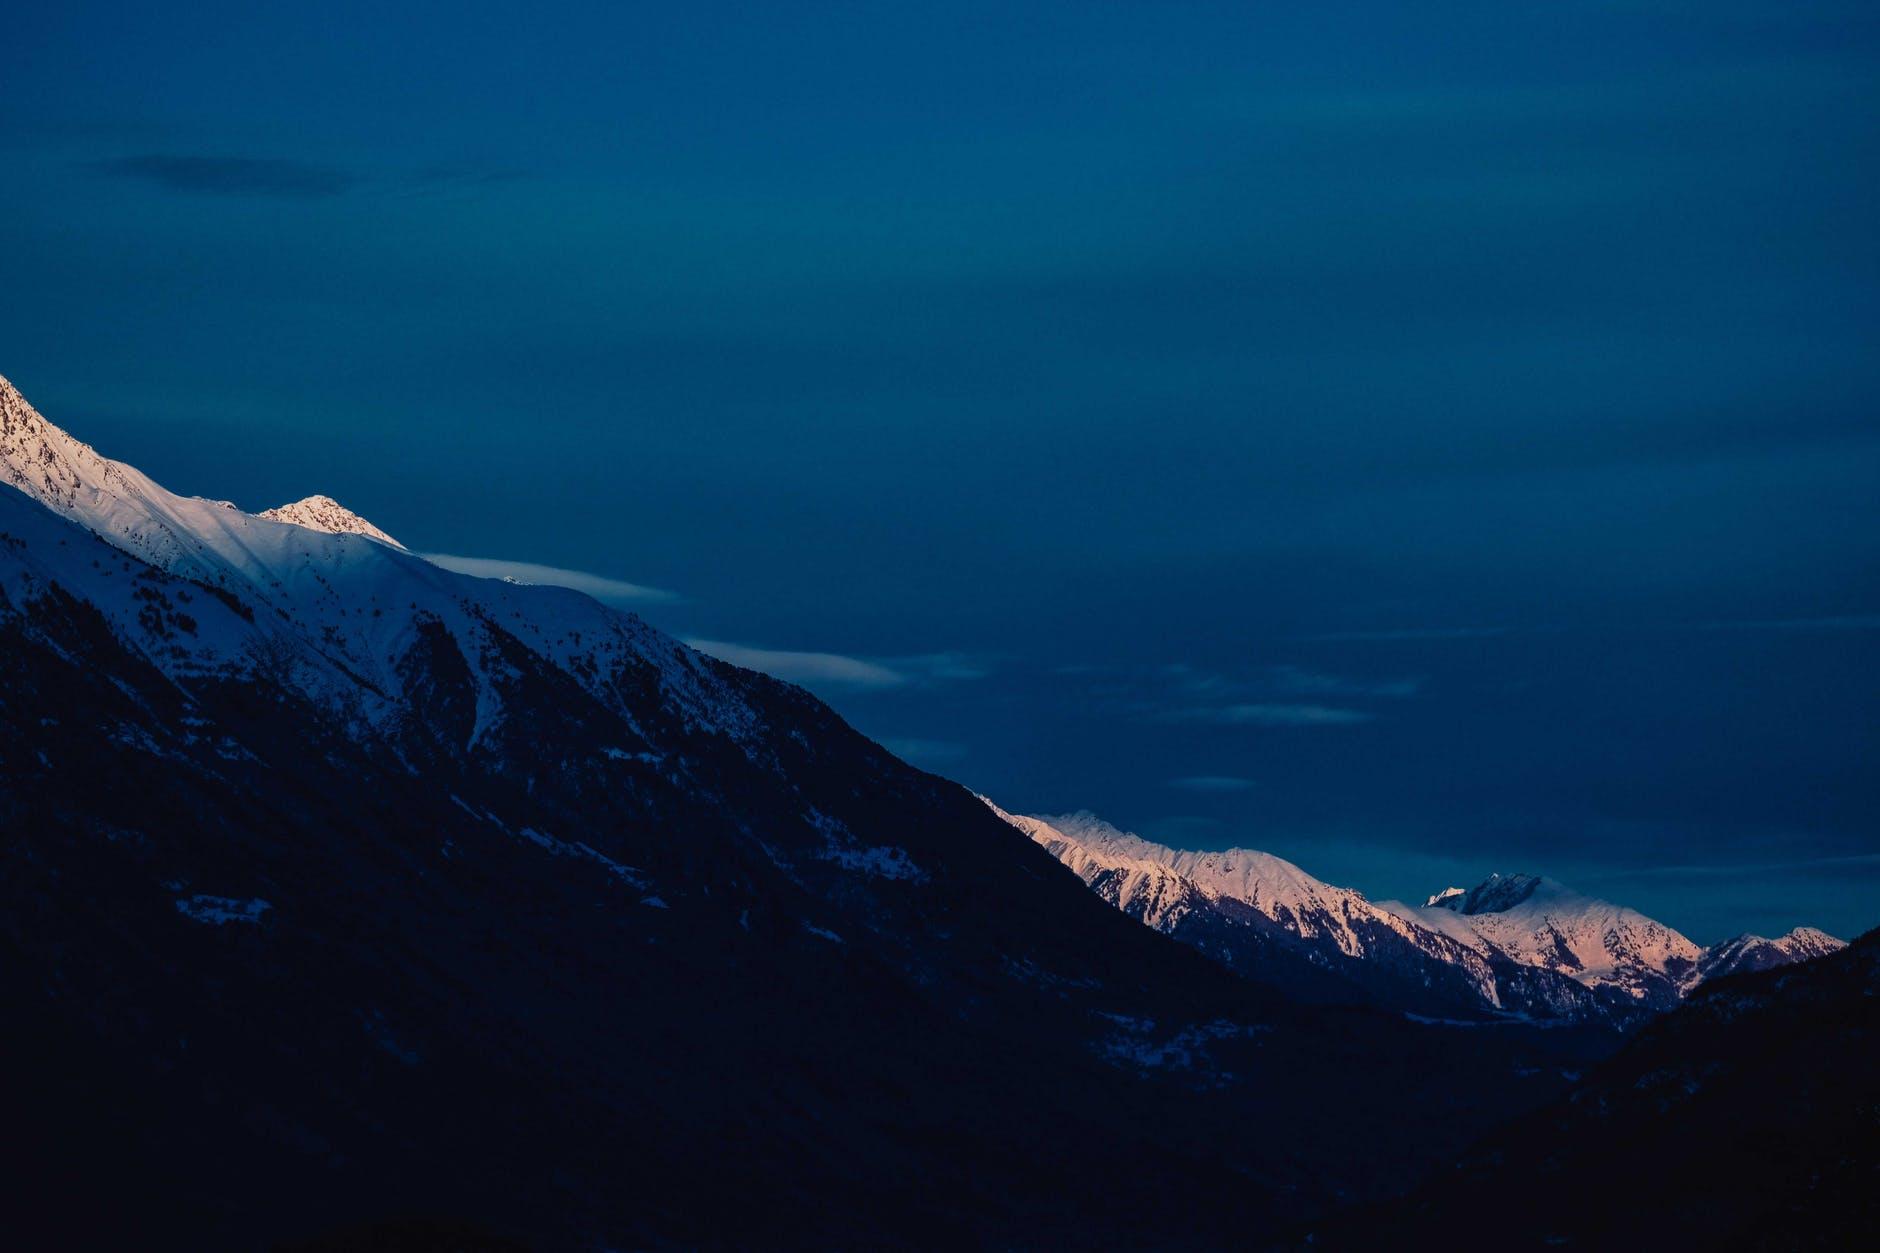 snowy mountainous valley under bright blue sky